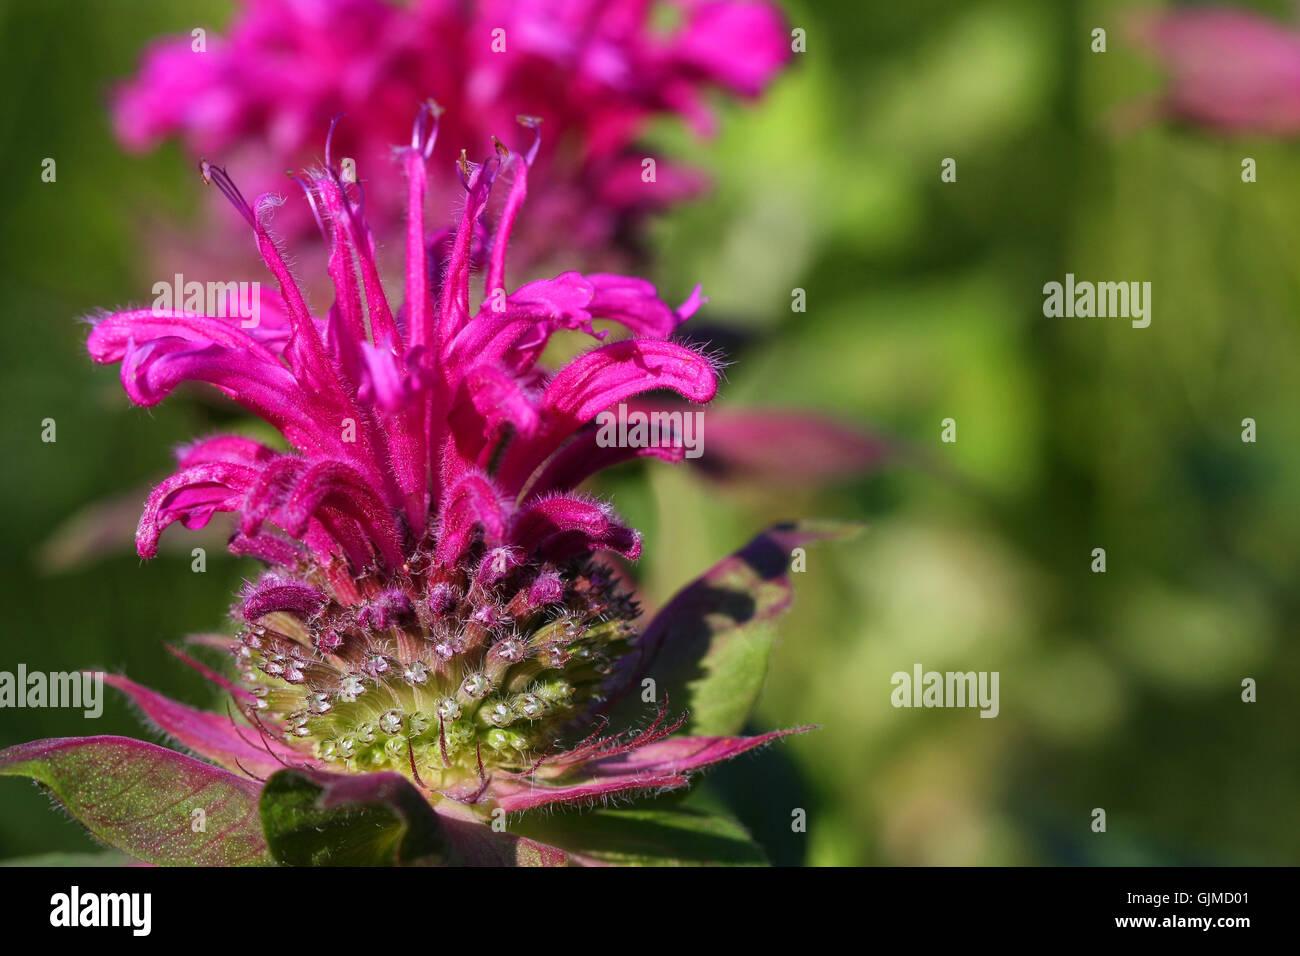 Bee Balm Flower - Stock Image